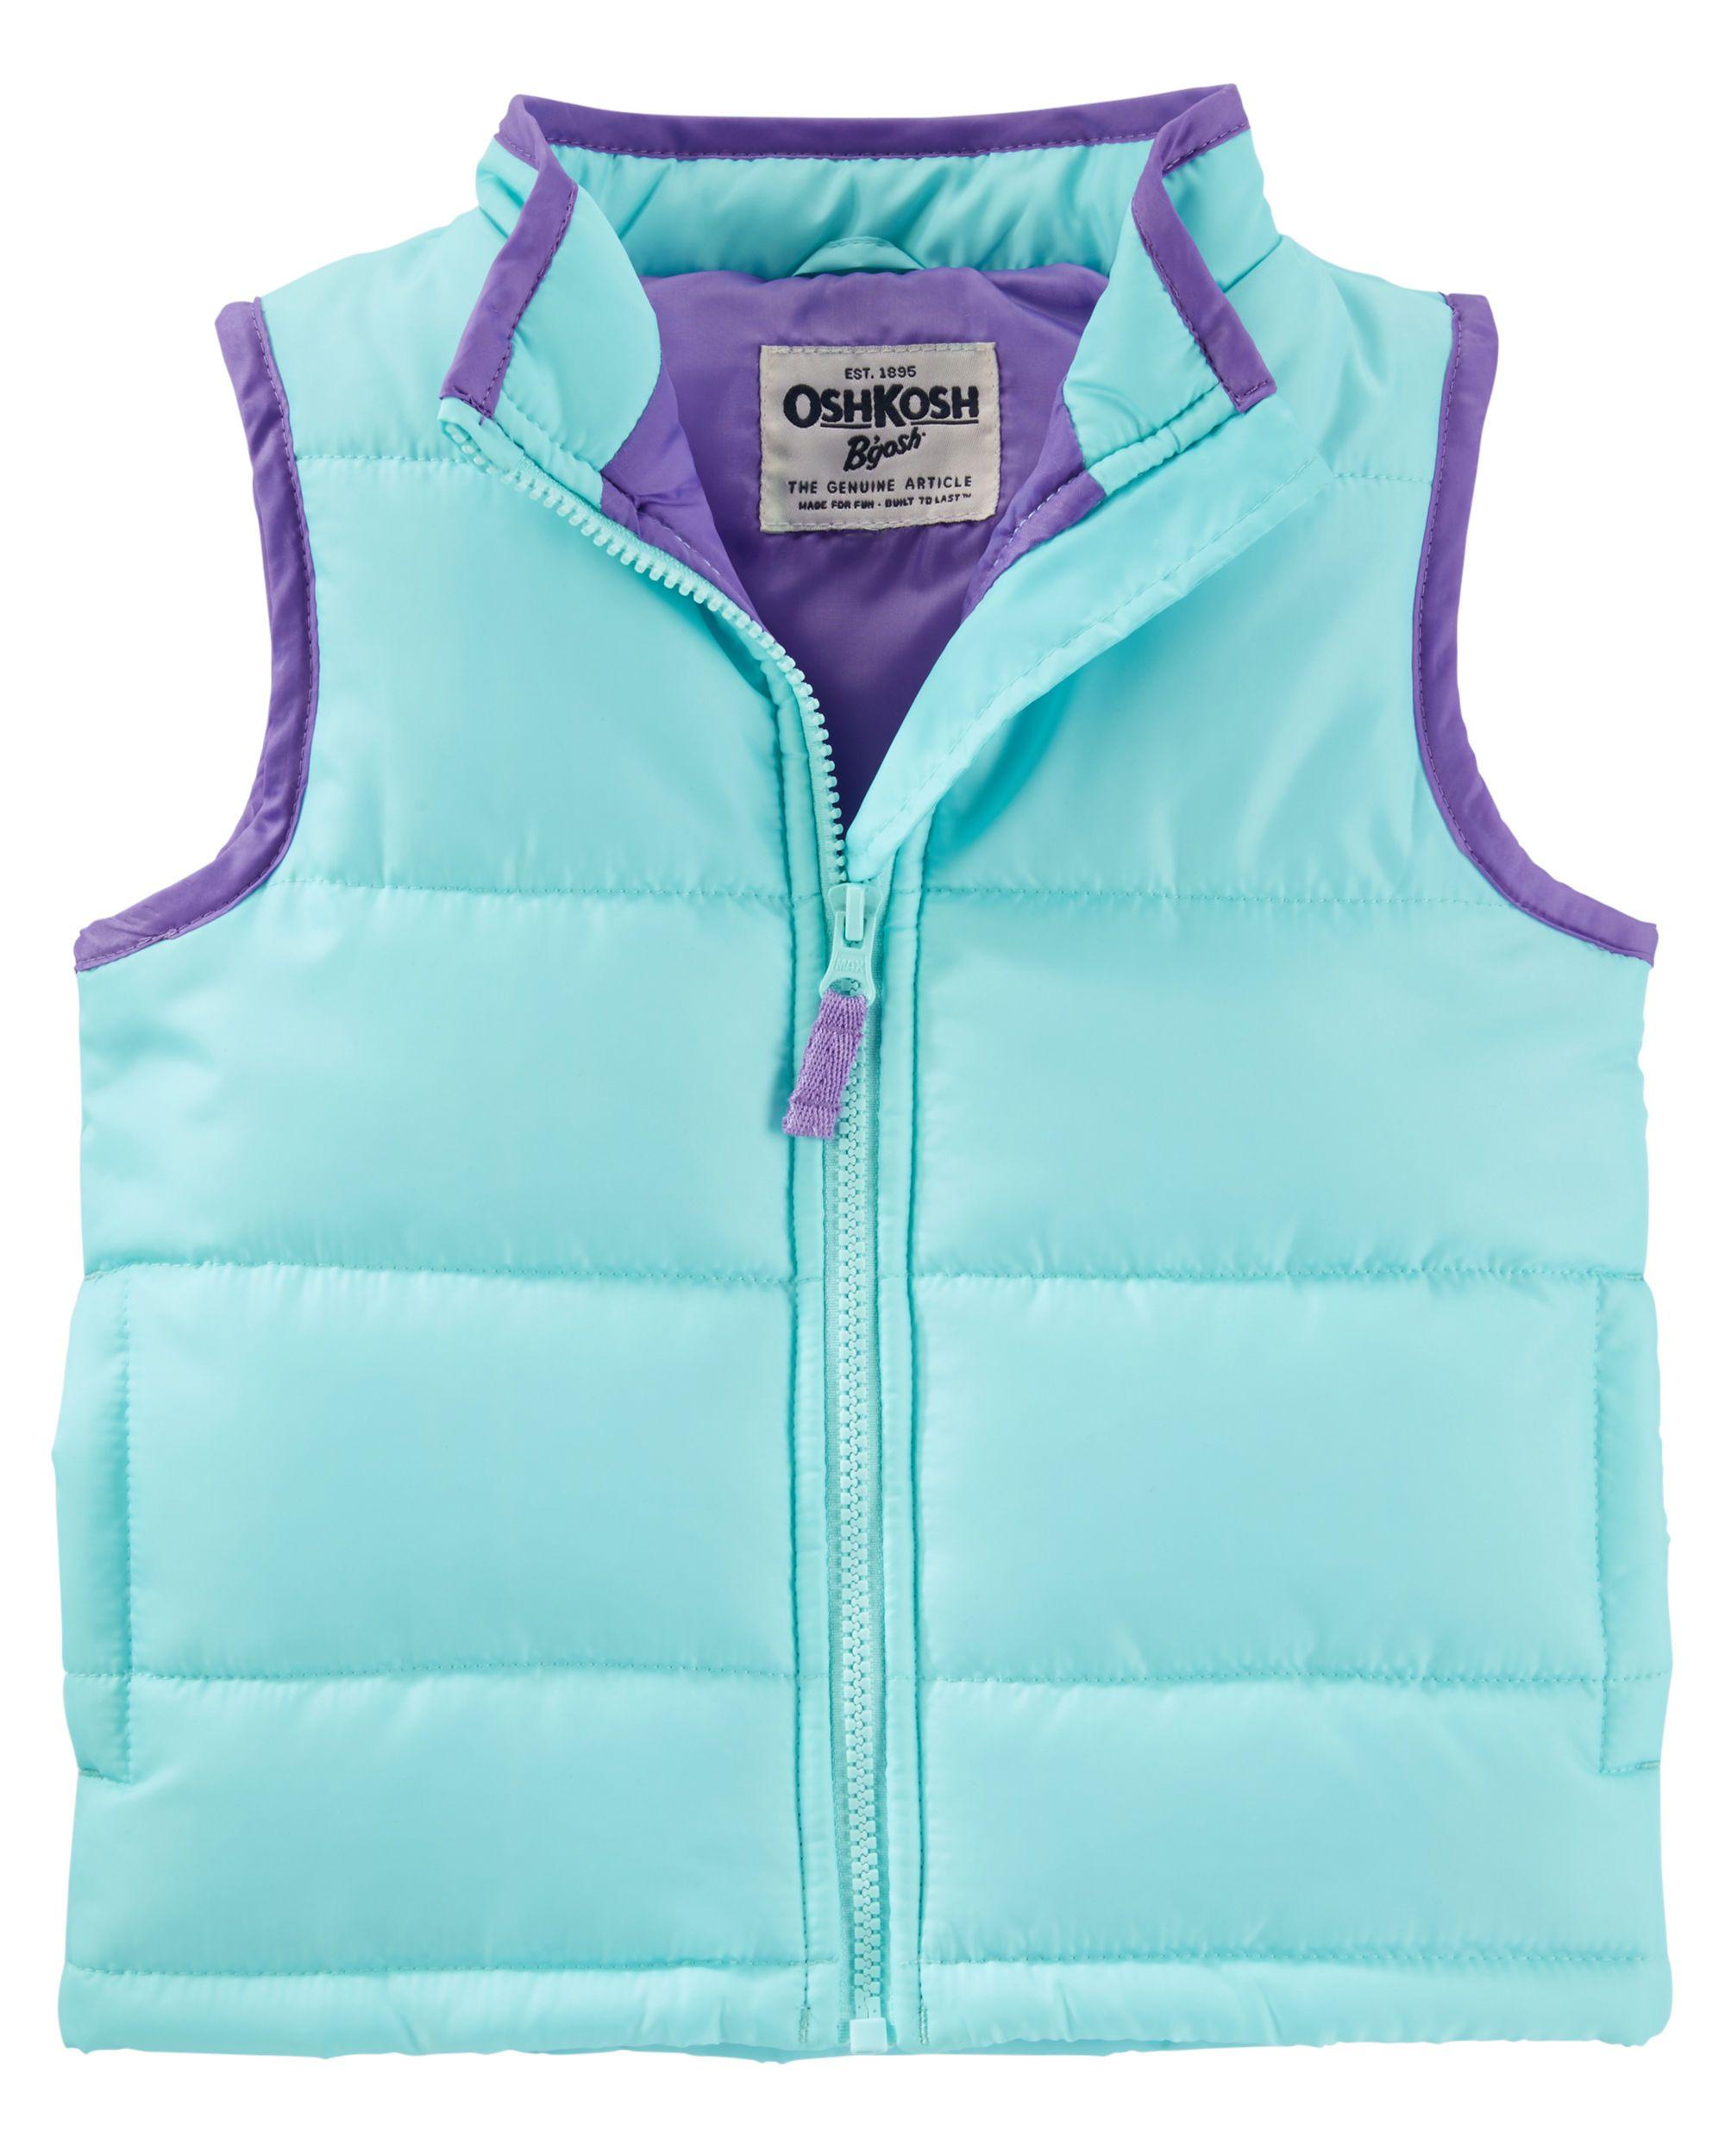 bdf26dea7fe7 OshKosh Quilted Puffer Vest